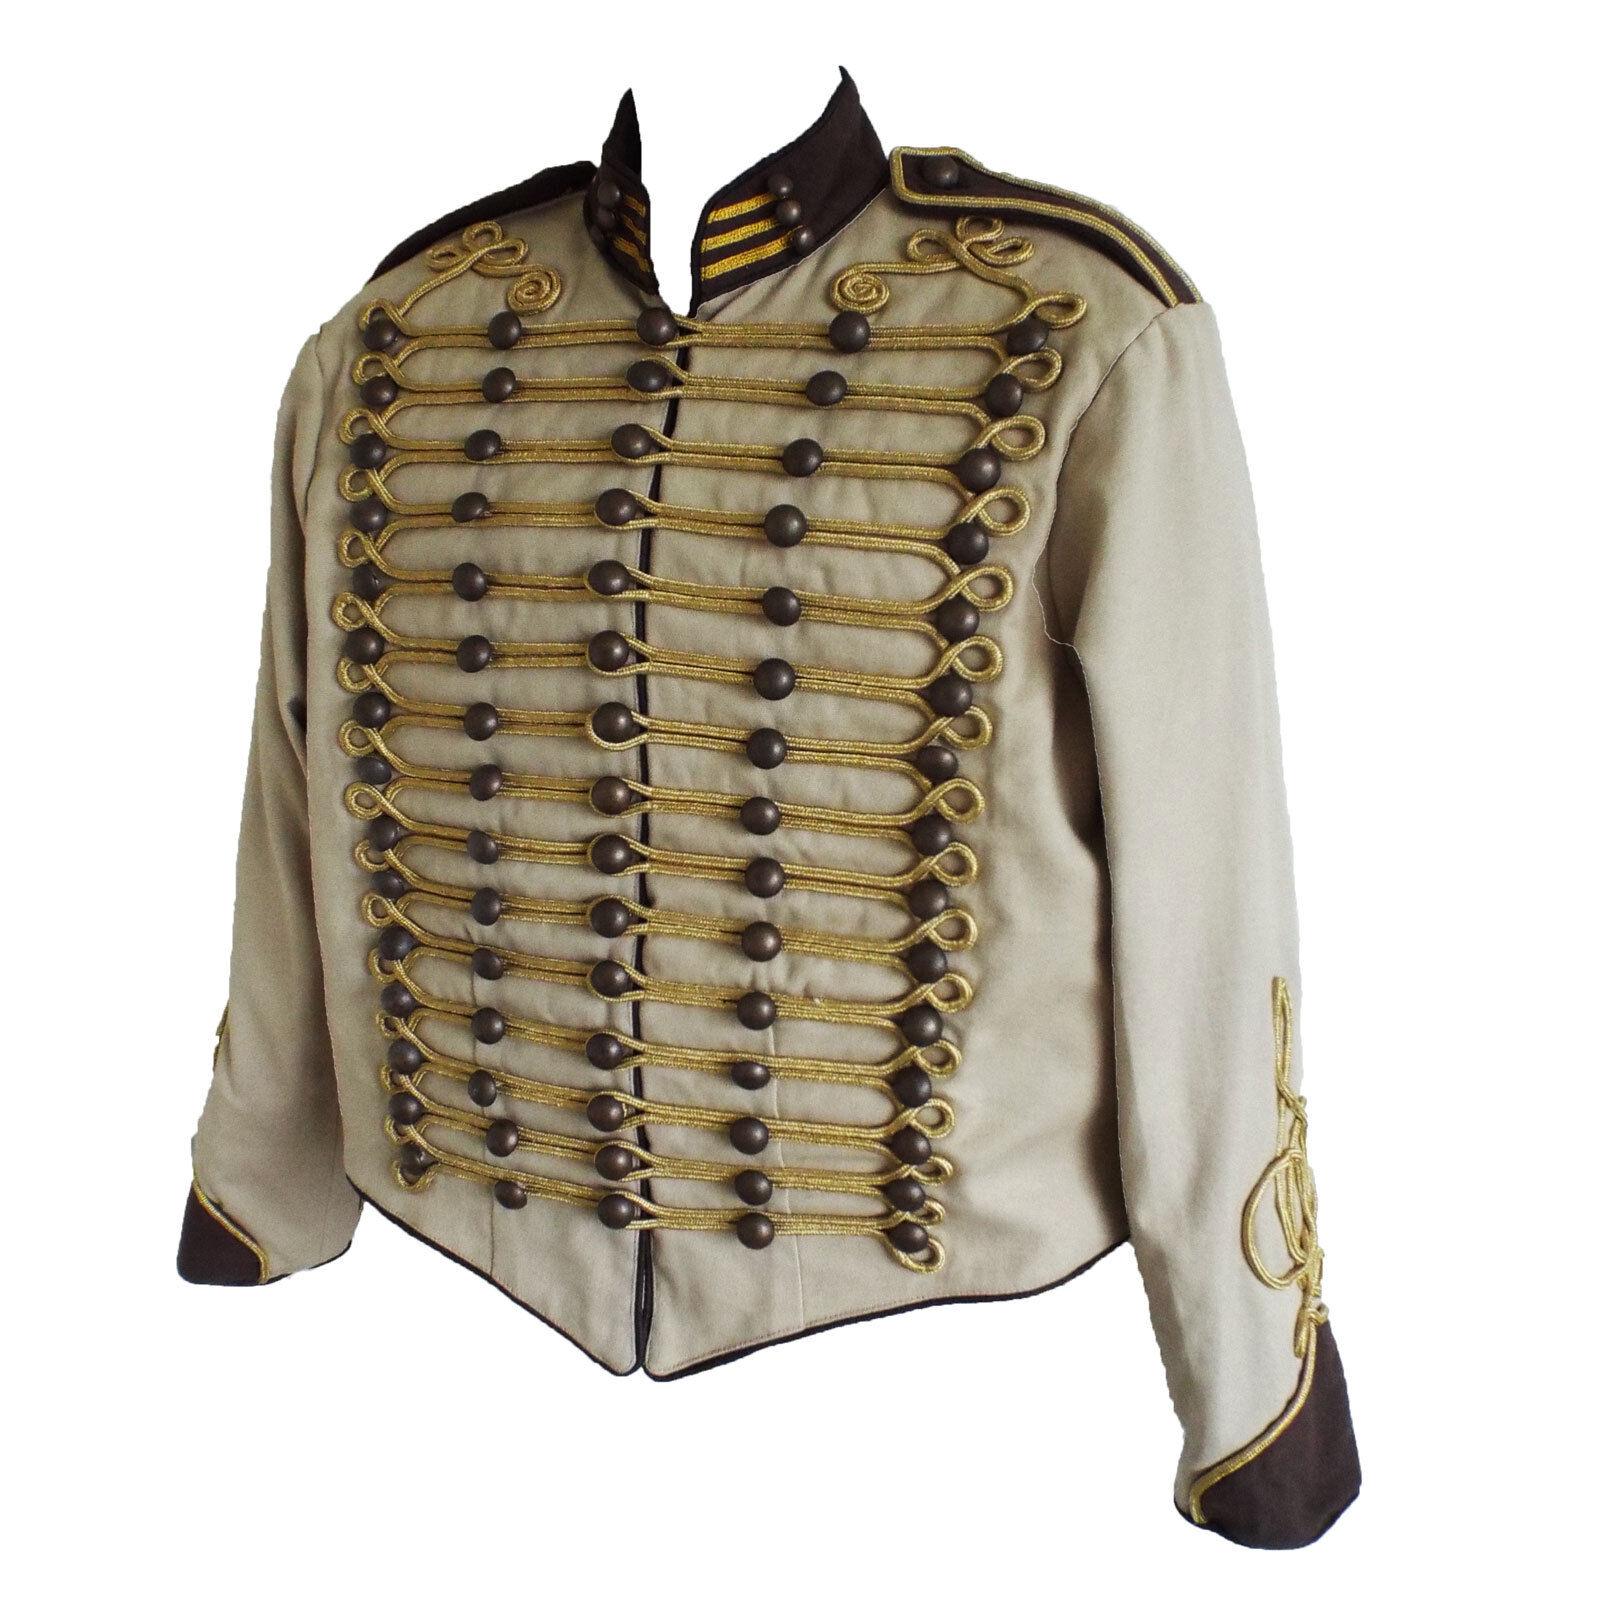 "/""Steampunk/"" Military Jacket by SDL in blue navy trim /& gold braid decoration"